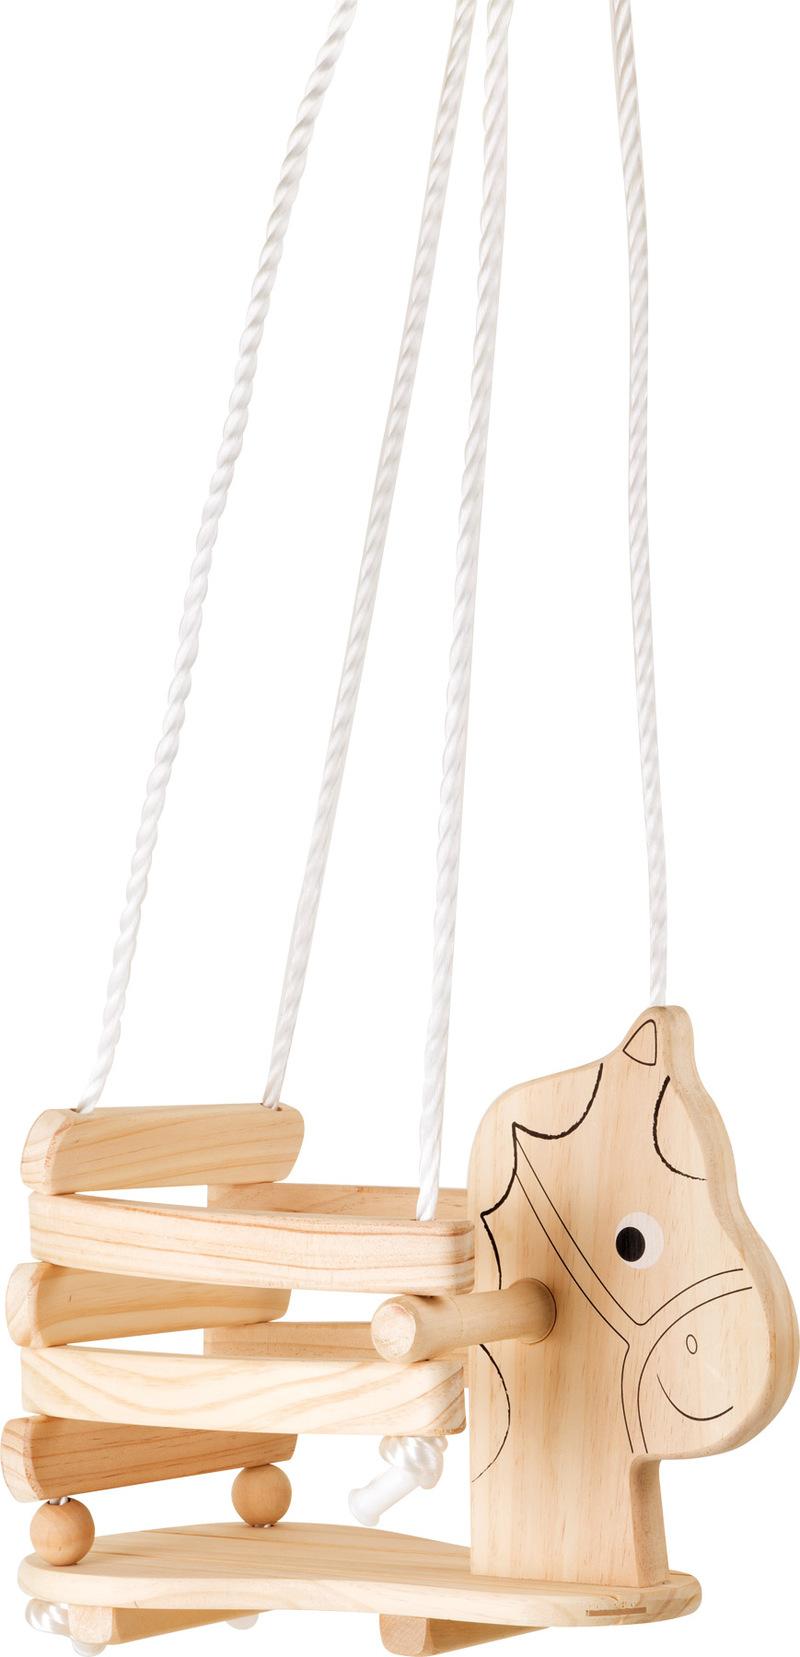 Wooden Children?s Swing Horse